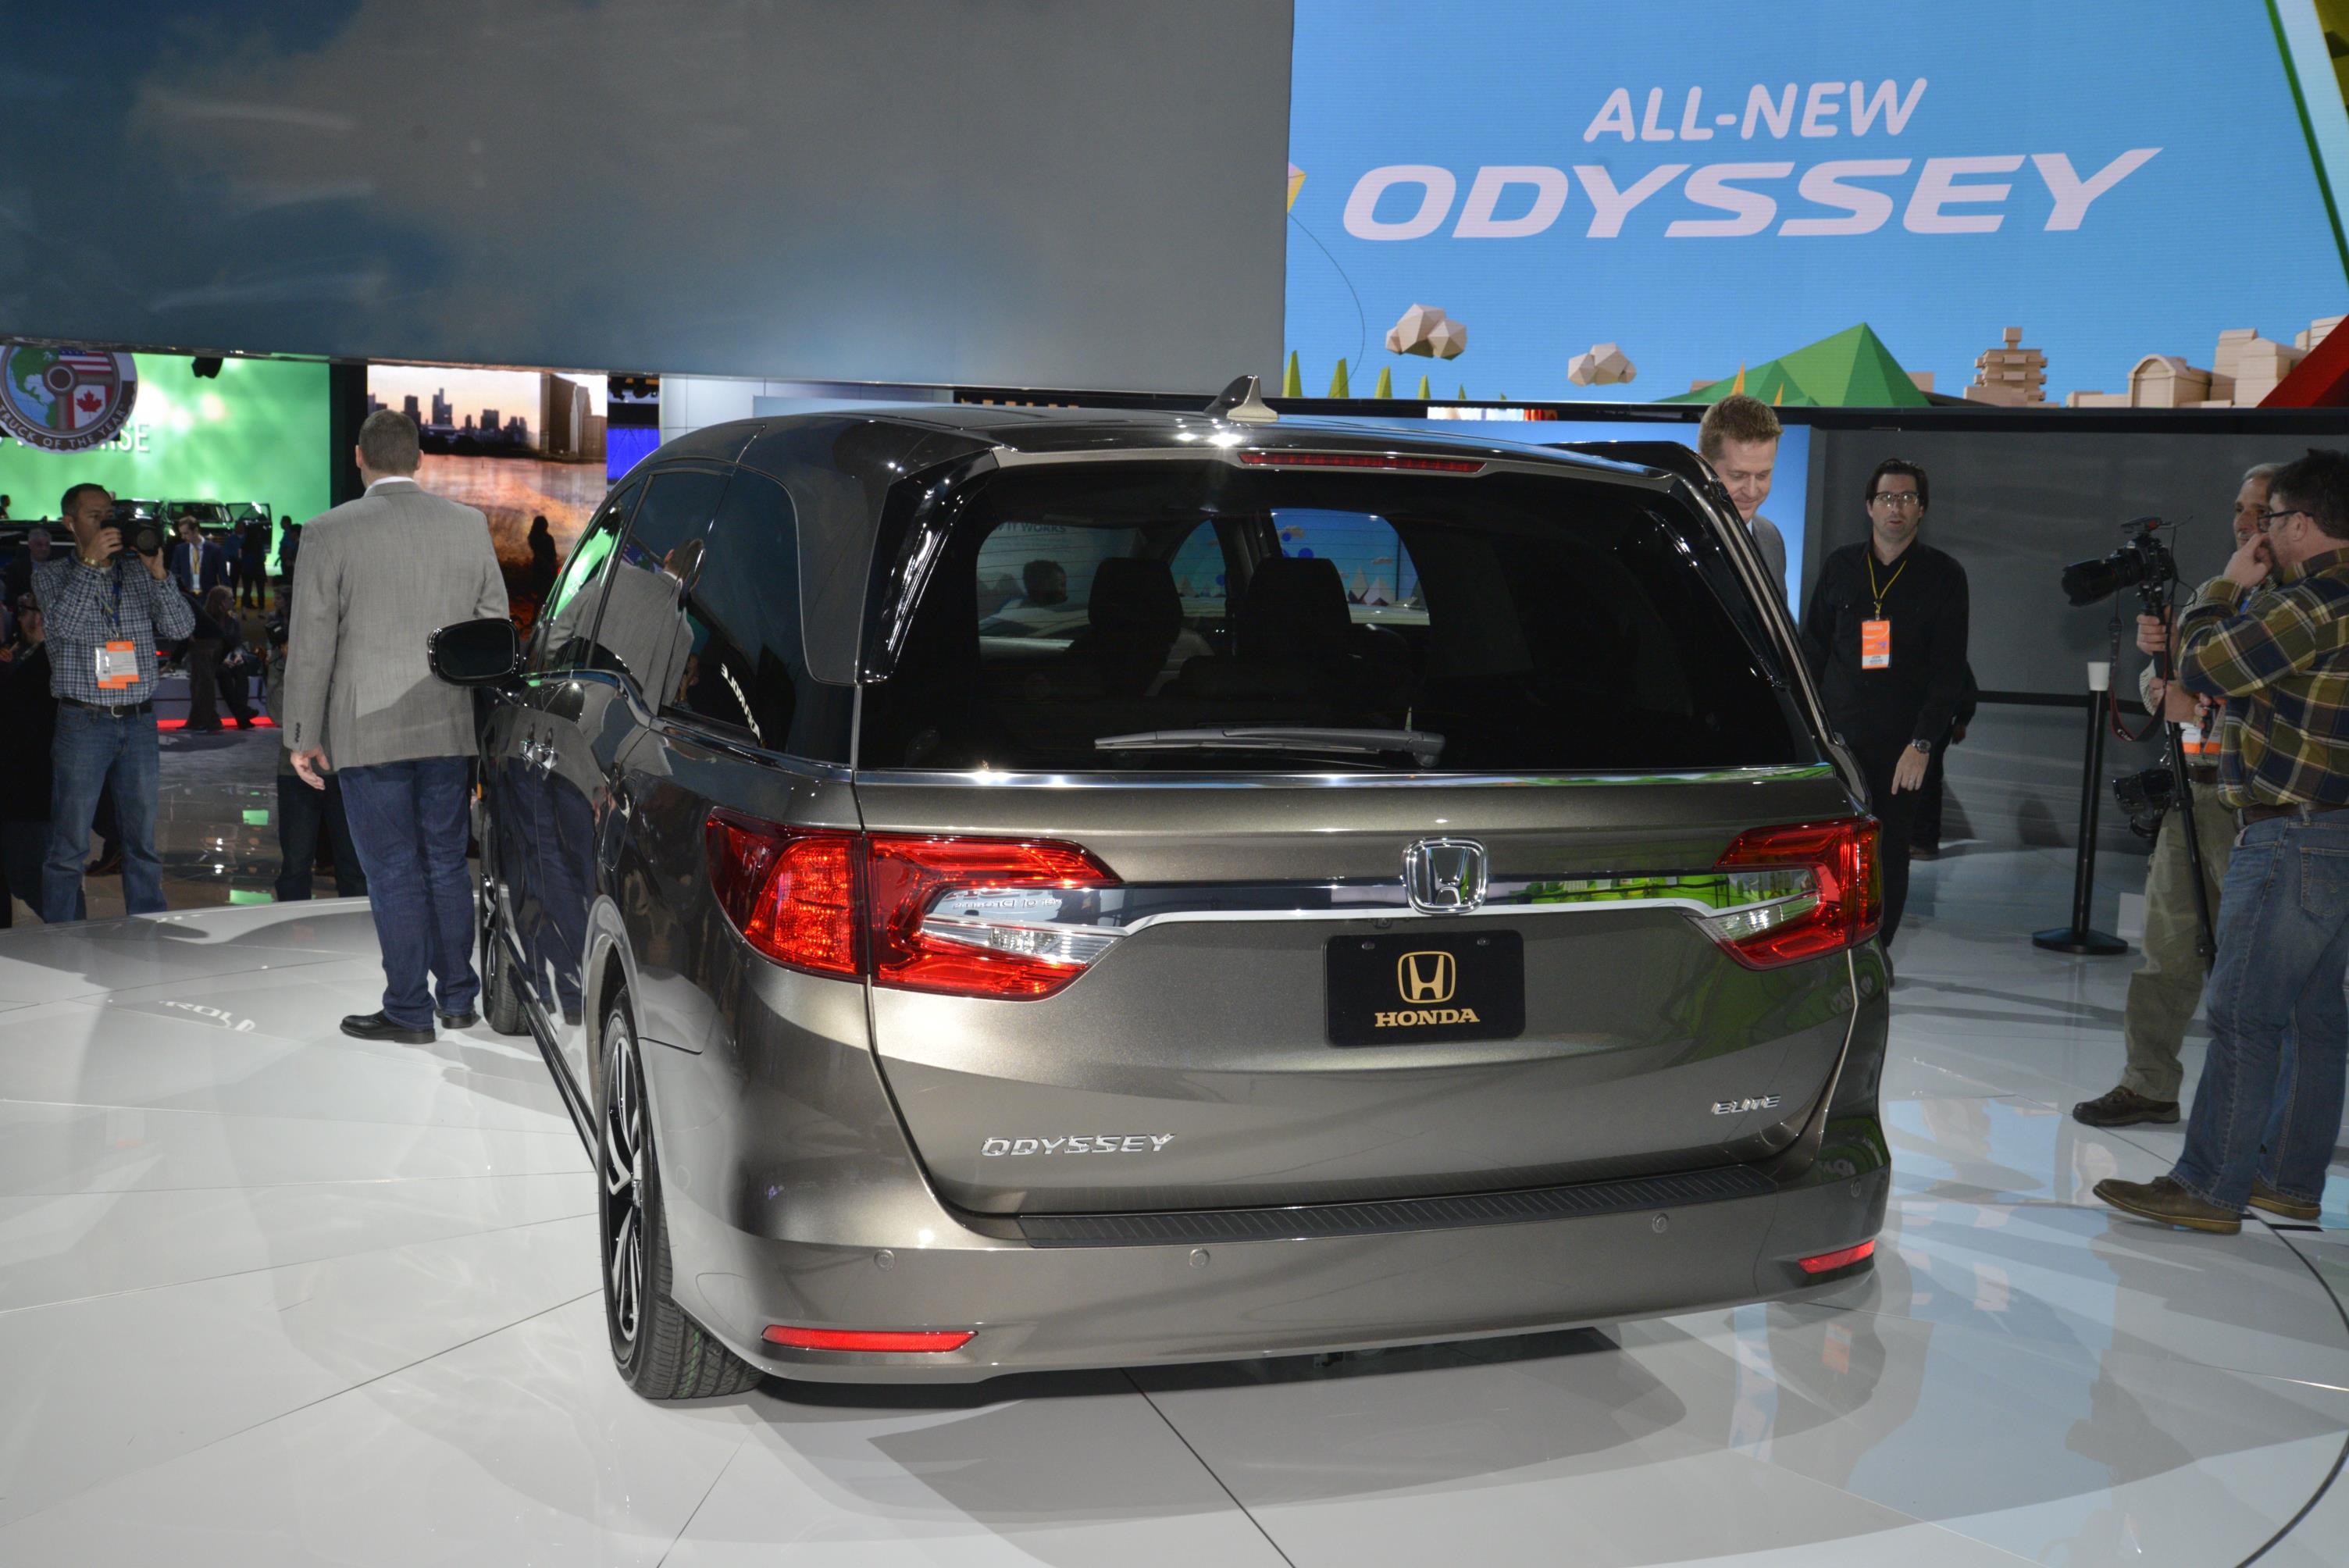 cars r type top minivan honda speed odyssey